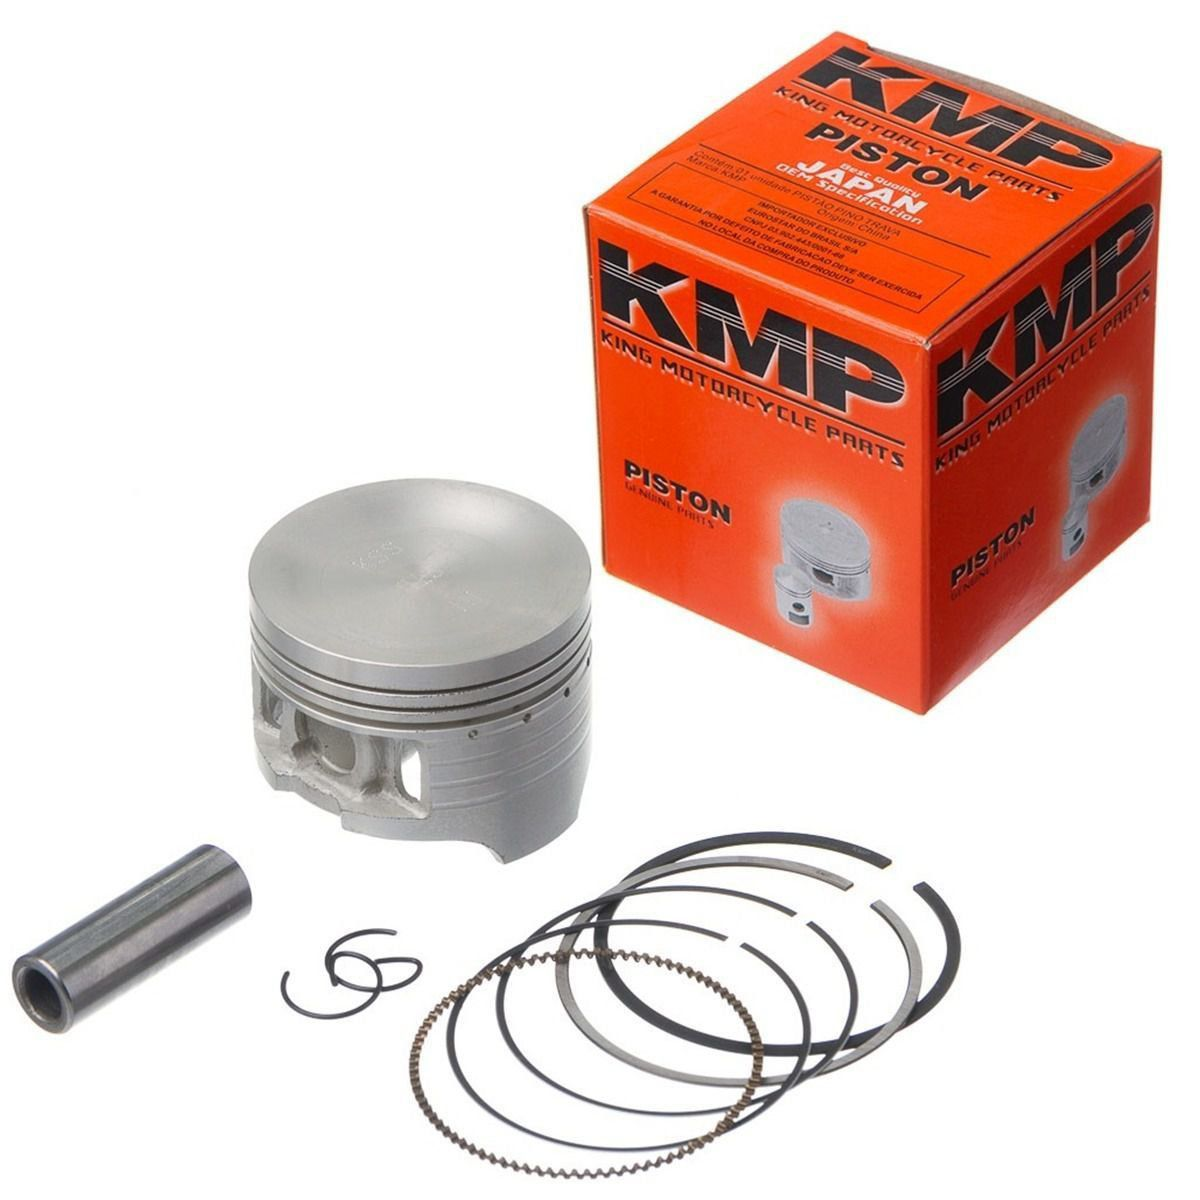 Kit Pistão Kmp Com Anéis Xlx 350 Std 0.50 0.75mm